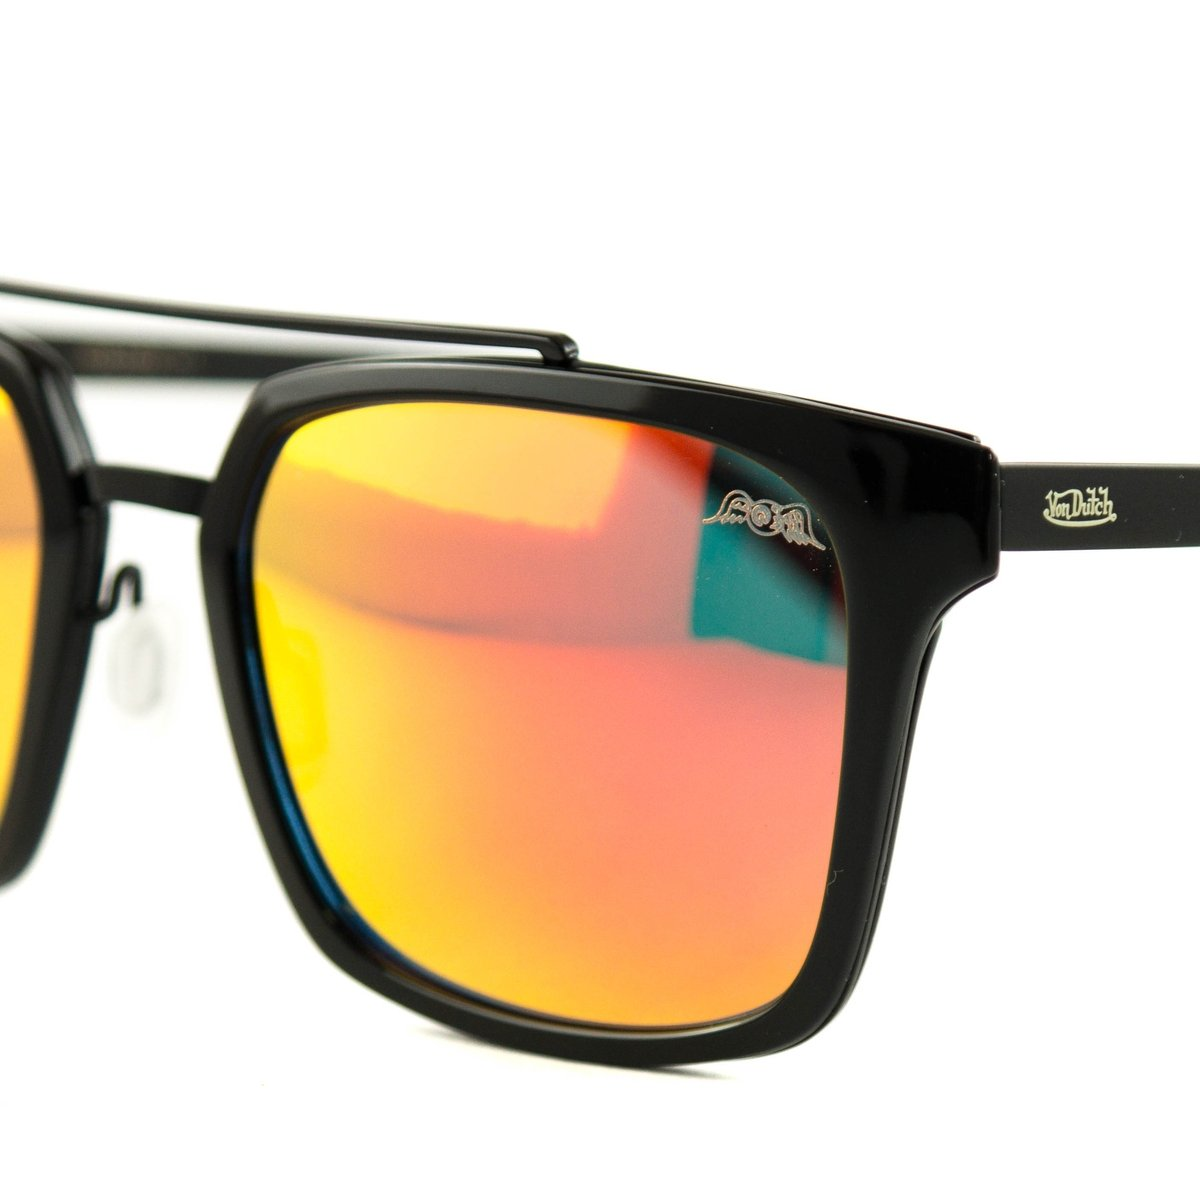 718141c316 Óculos Von Dutch De Sol - Preto e Laranja